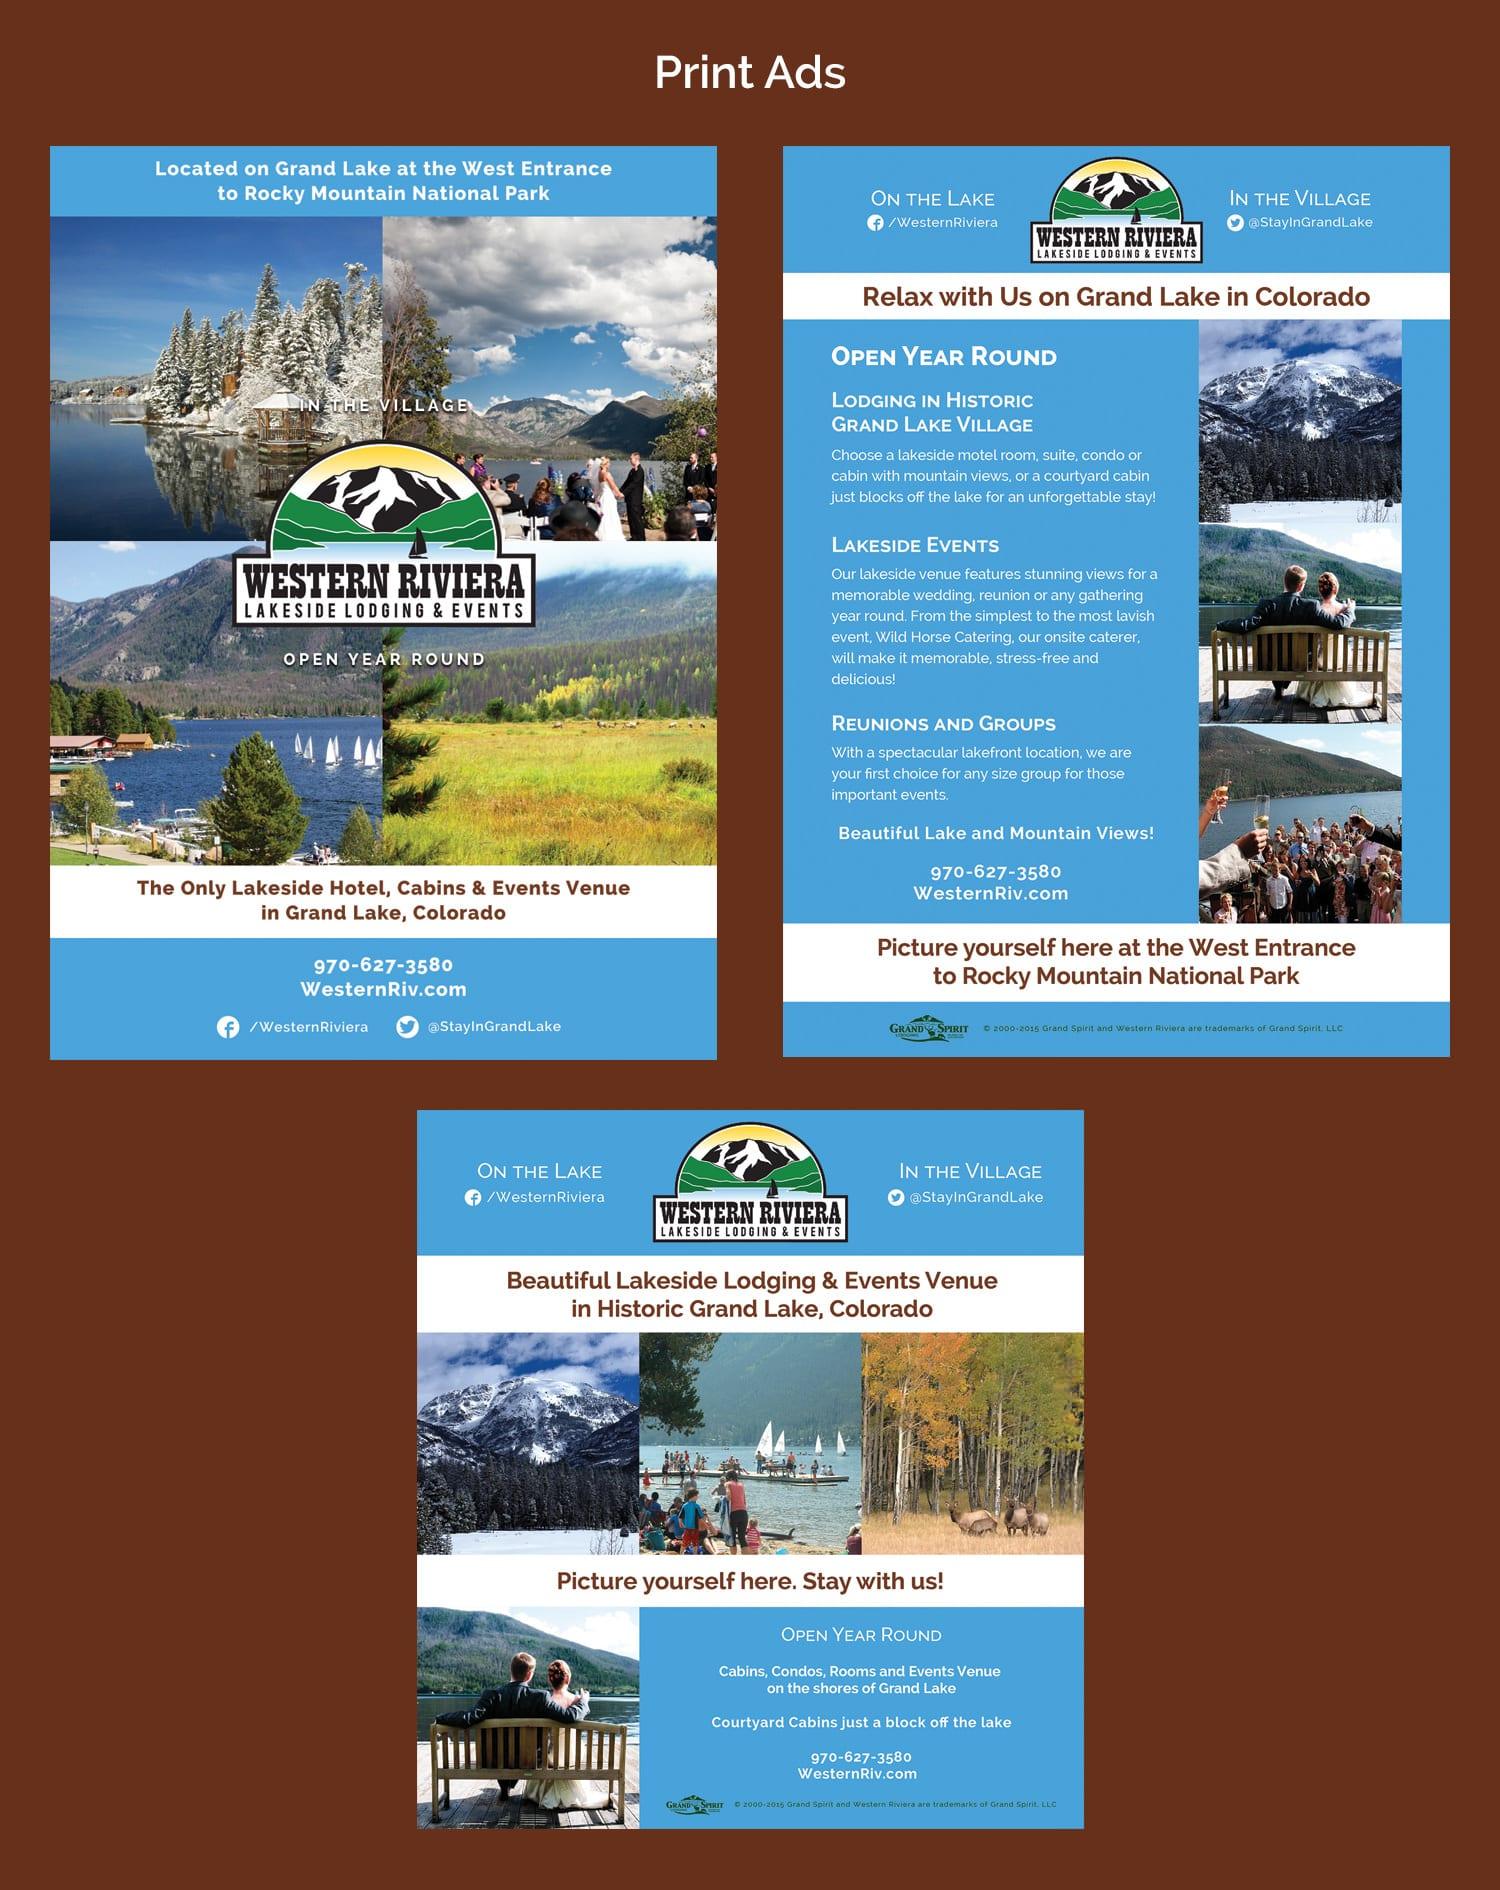 western-riviera-print-advertisements